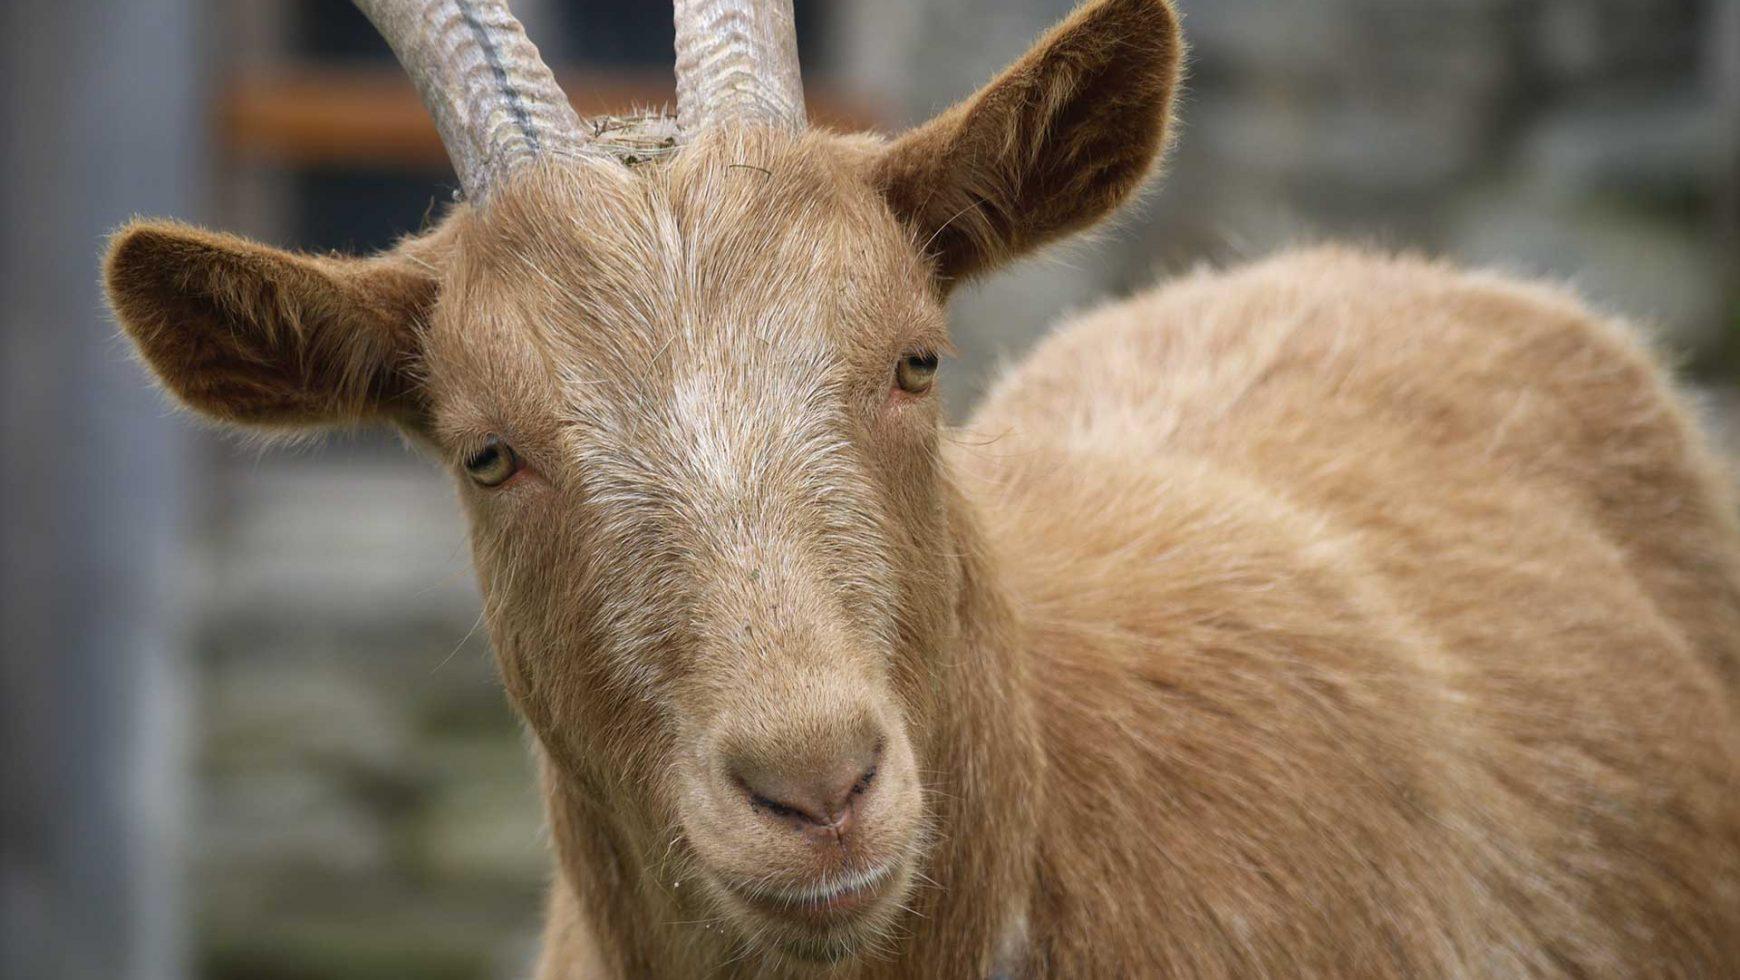 Goats! At the Minnesota Valley Wildlife Refuge